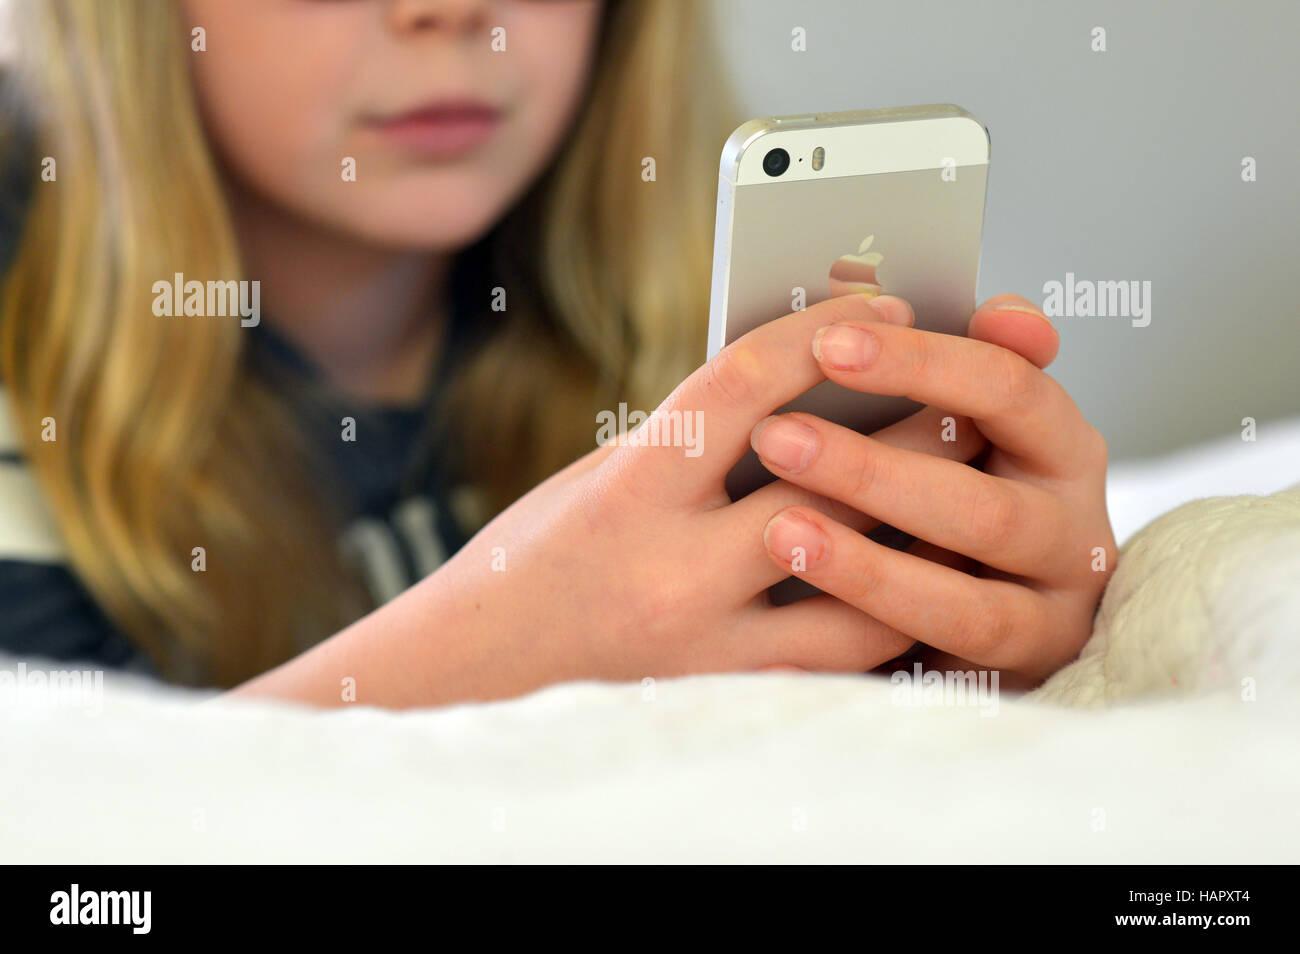 Teen / tween girl holding a mobile phone (iphone) - Stock Image